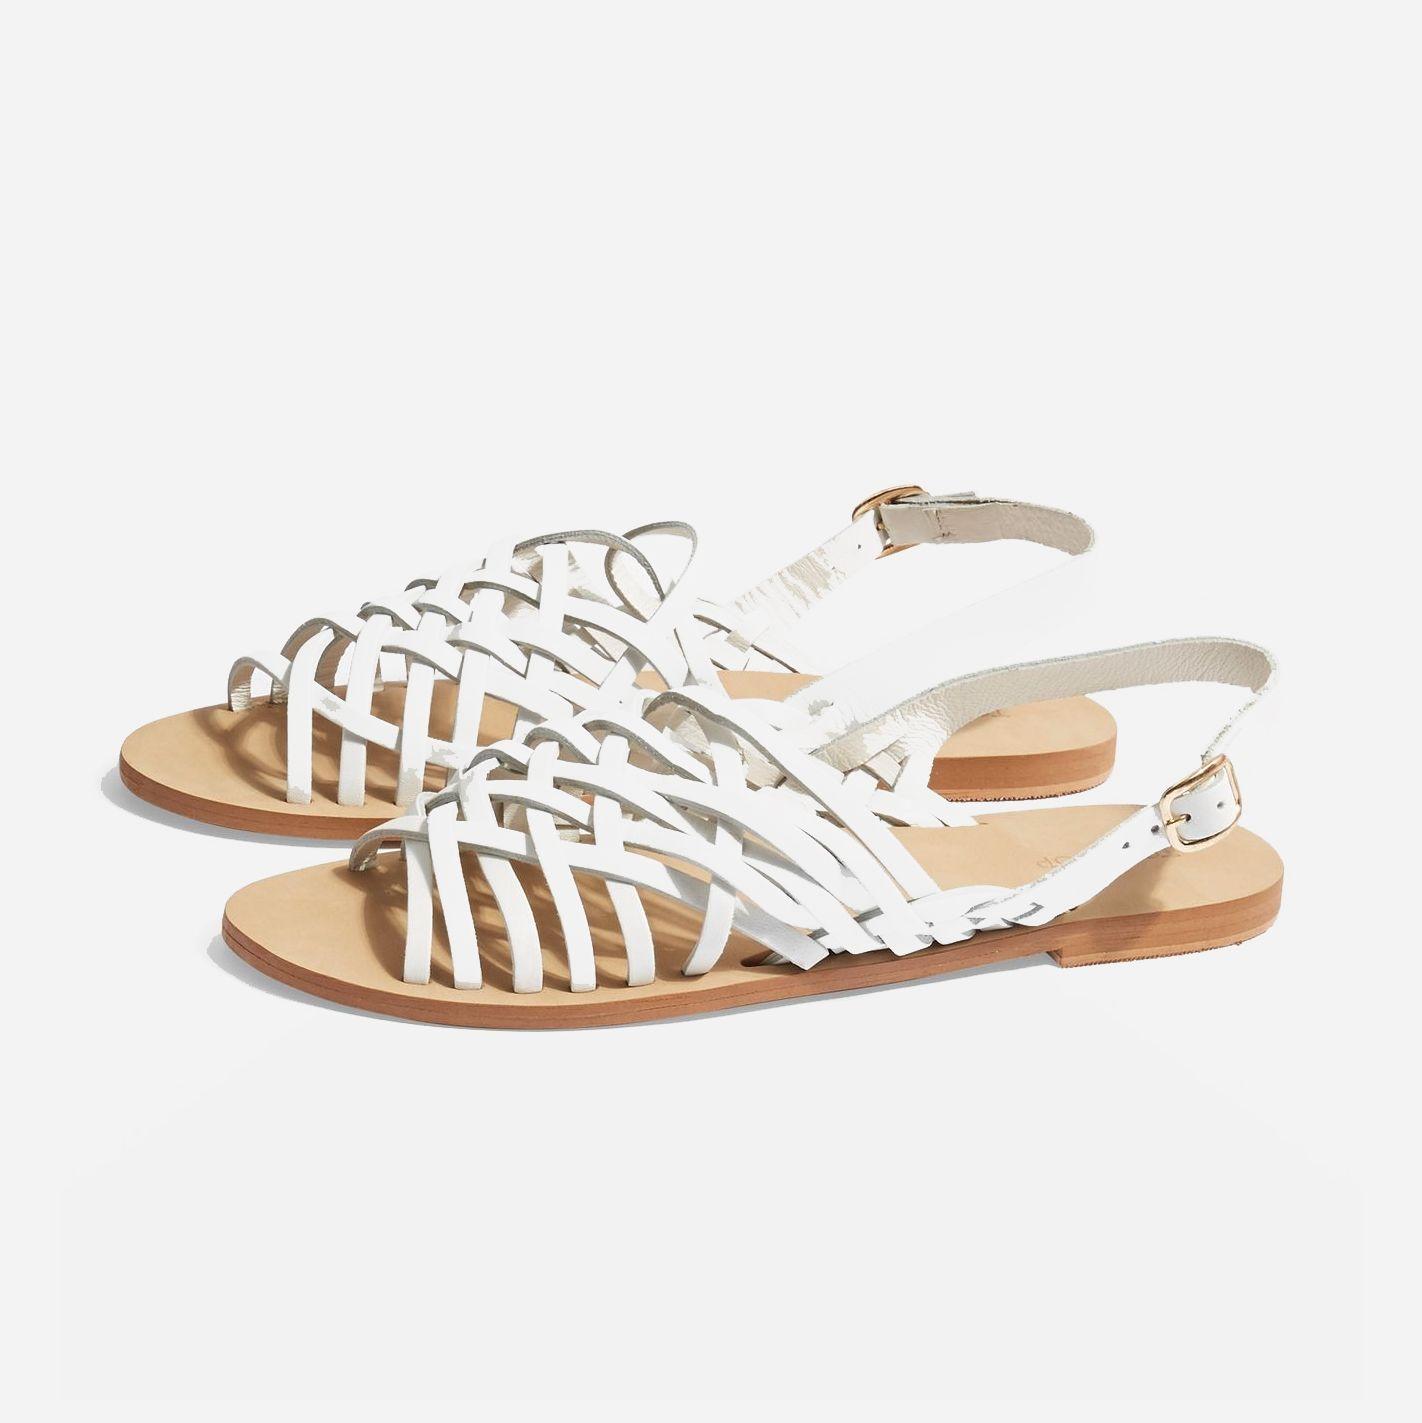 holiday capsule wardrobe: sandals